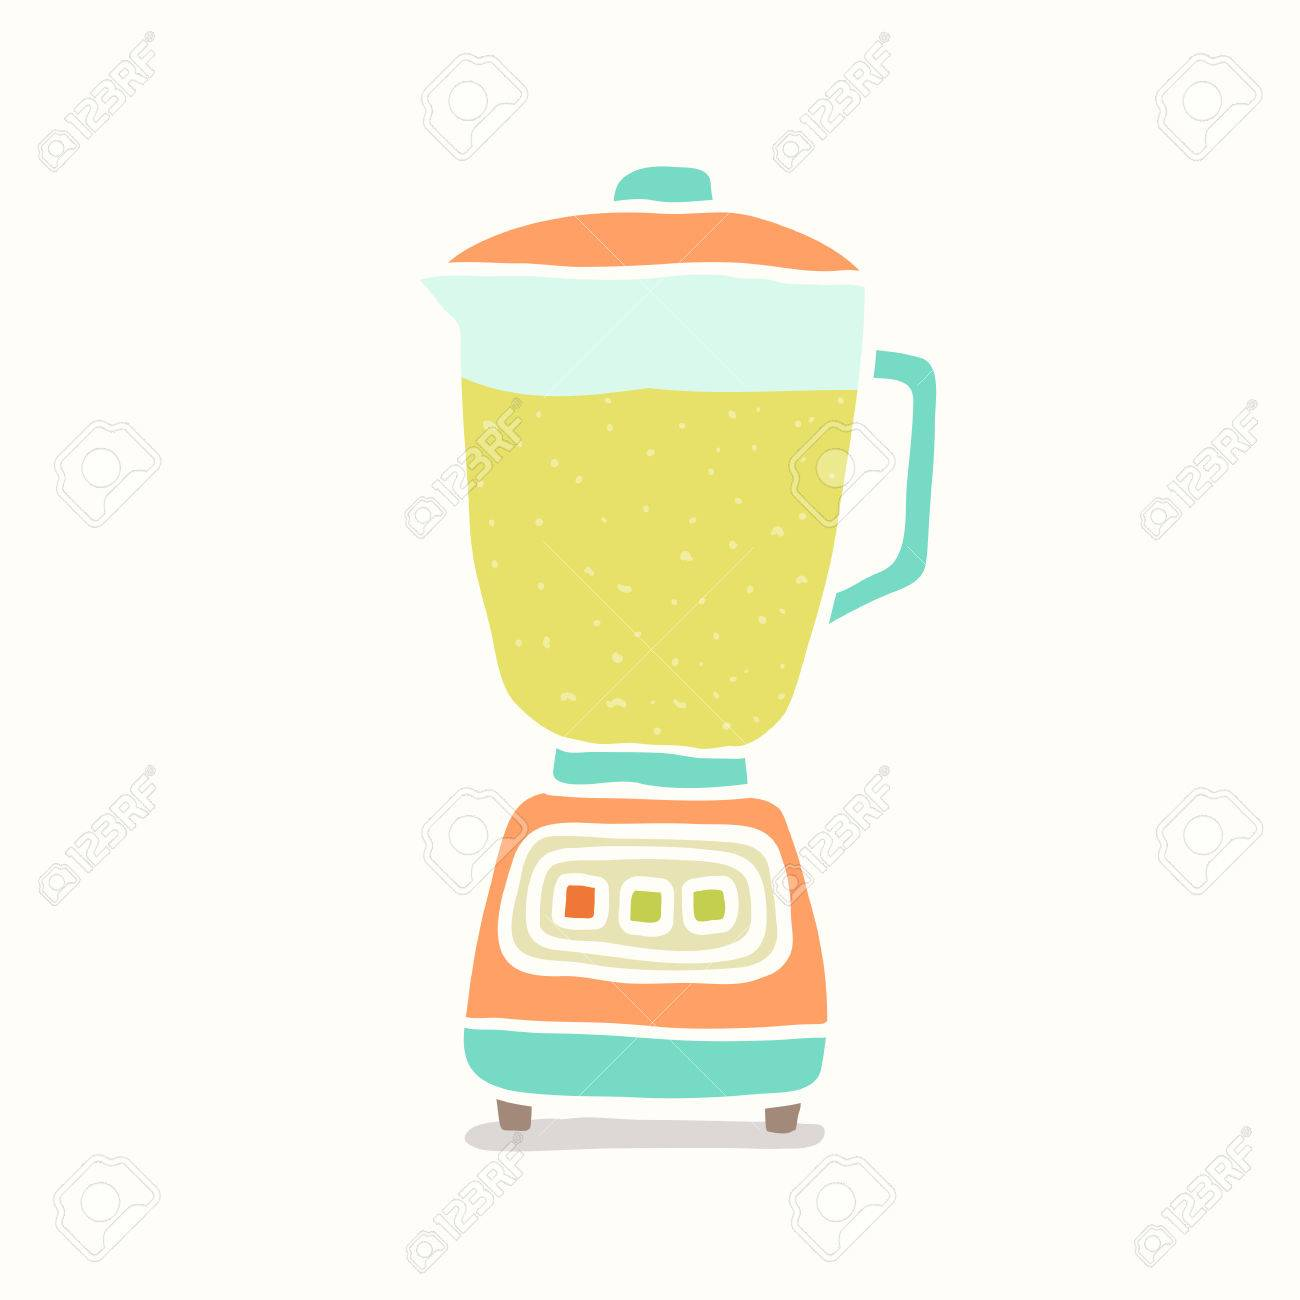 Blender making fruit smoothie. Vector EPS 10 hand drawn illustration - 34014557